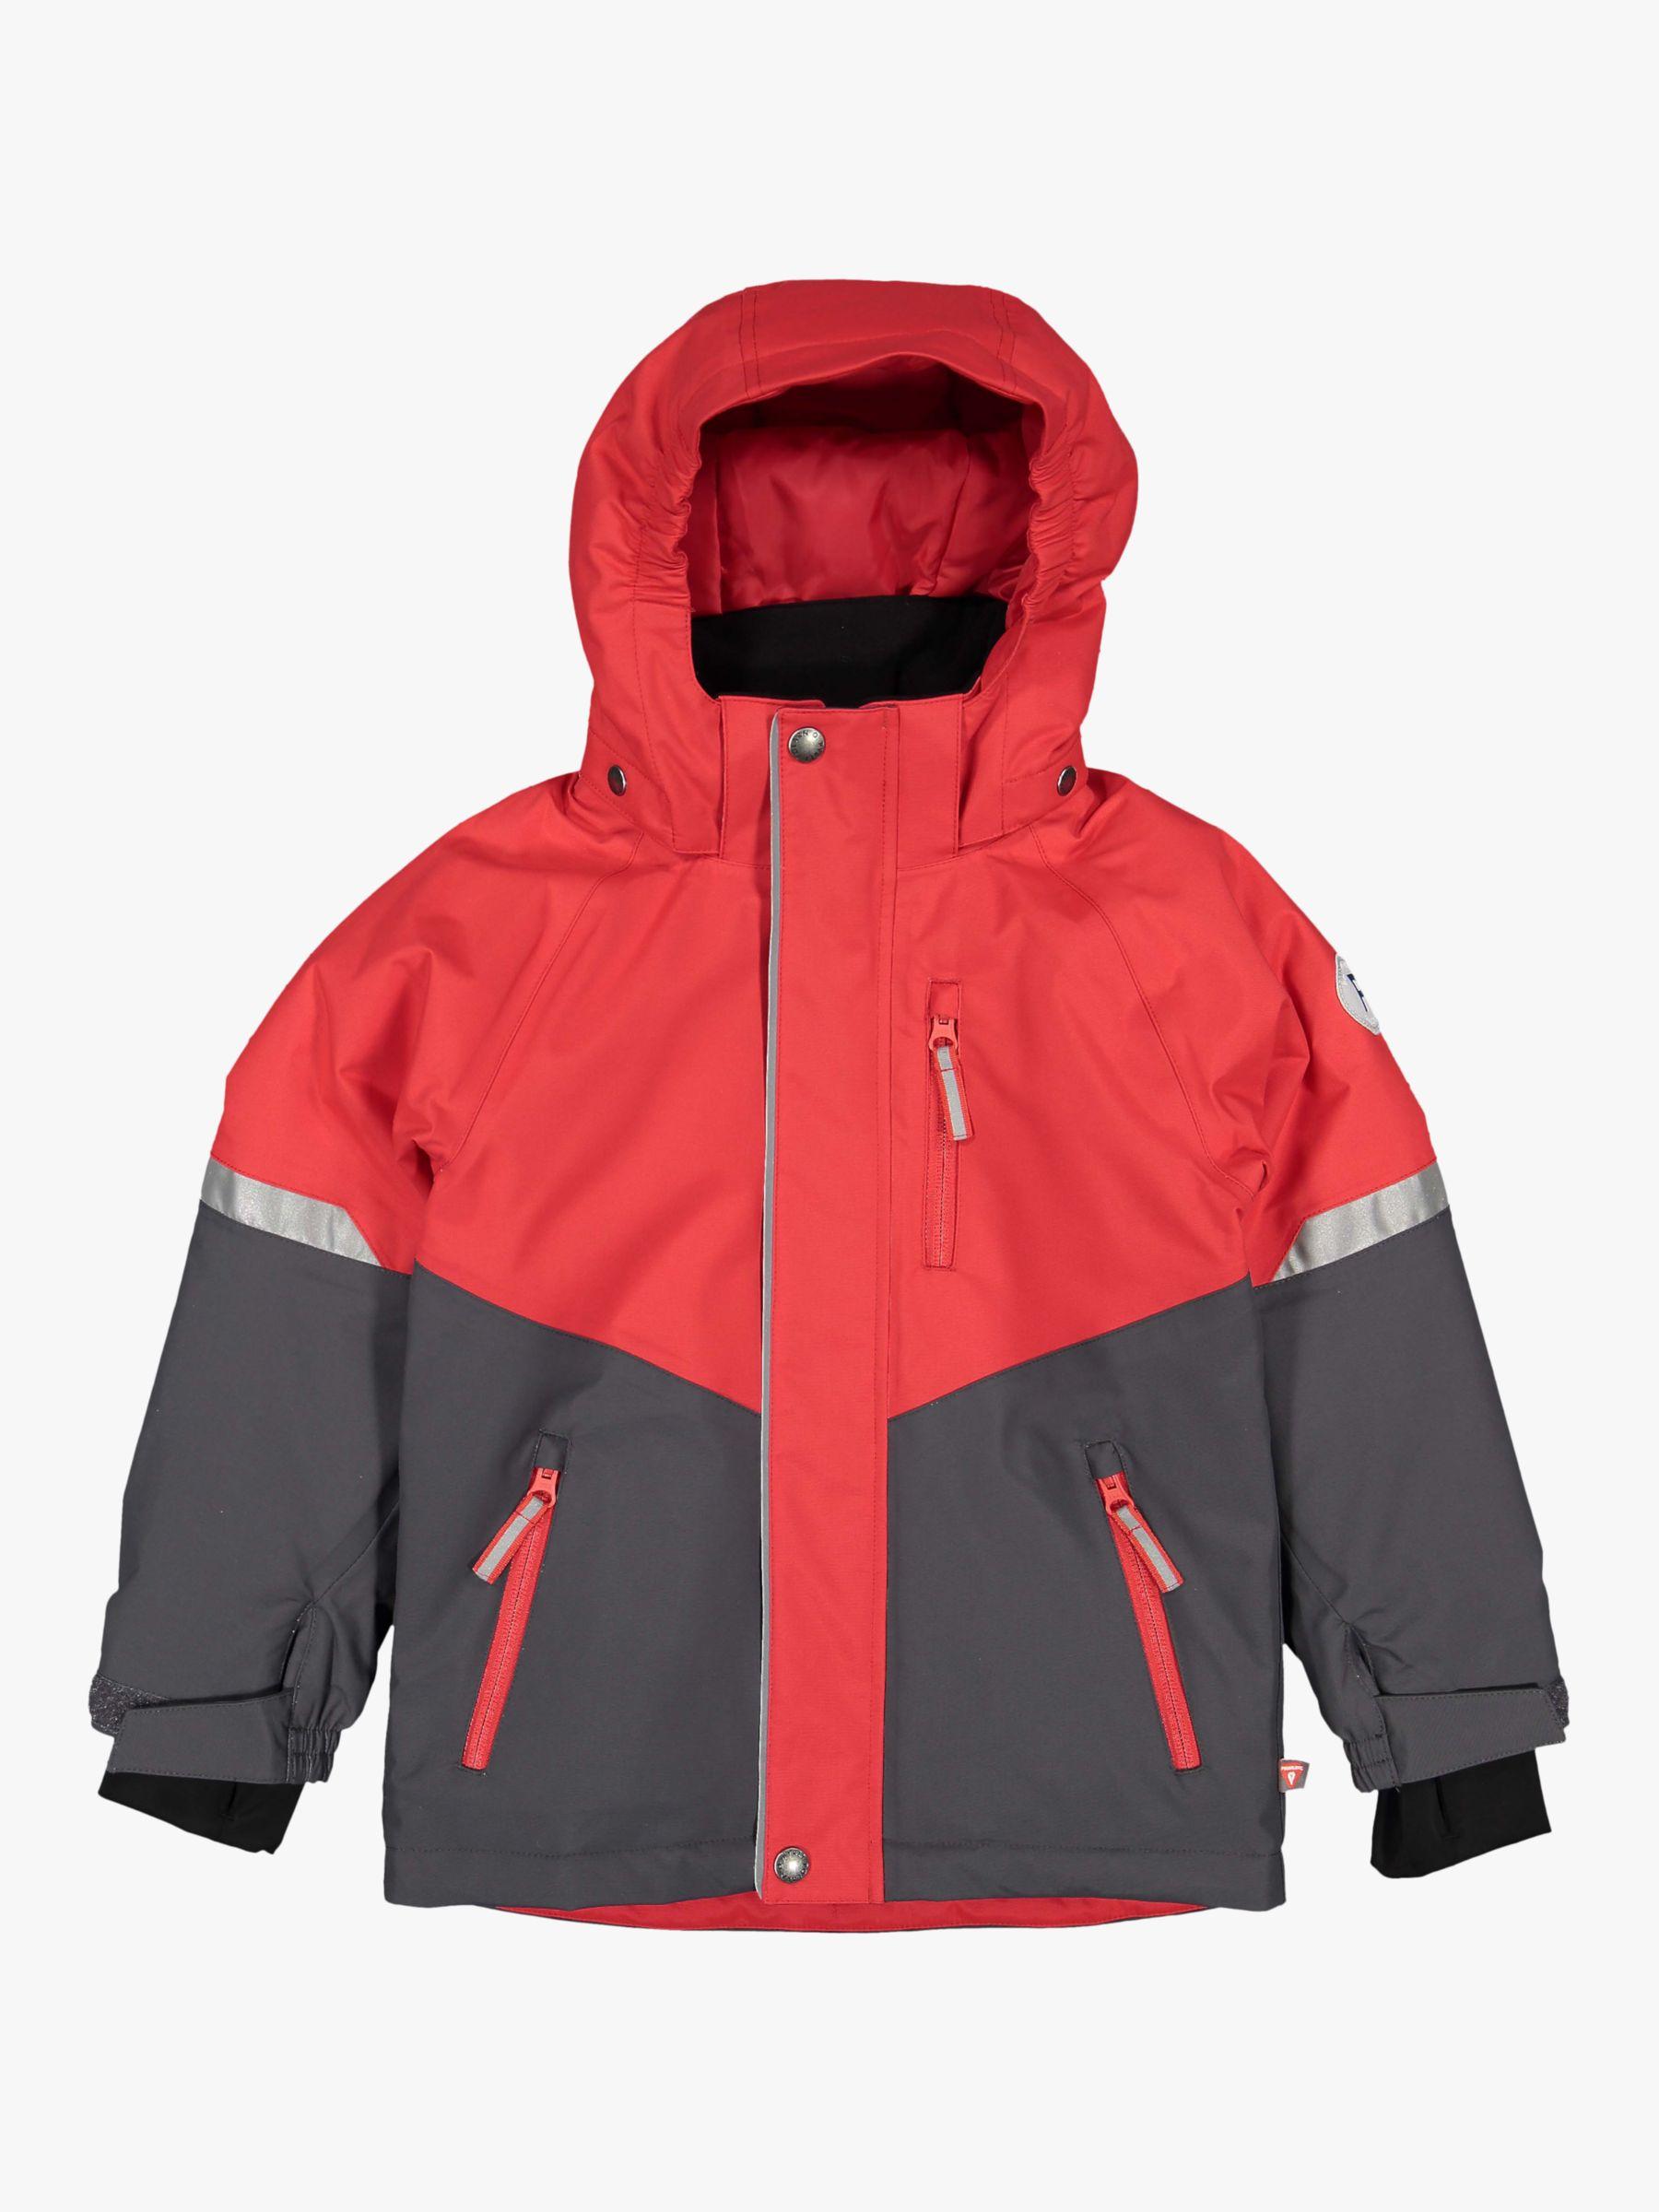 Polarn O. Pyret Polarn O. Pyret Children's Winter Jacket, Ribbon Red